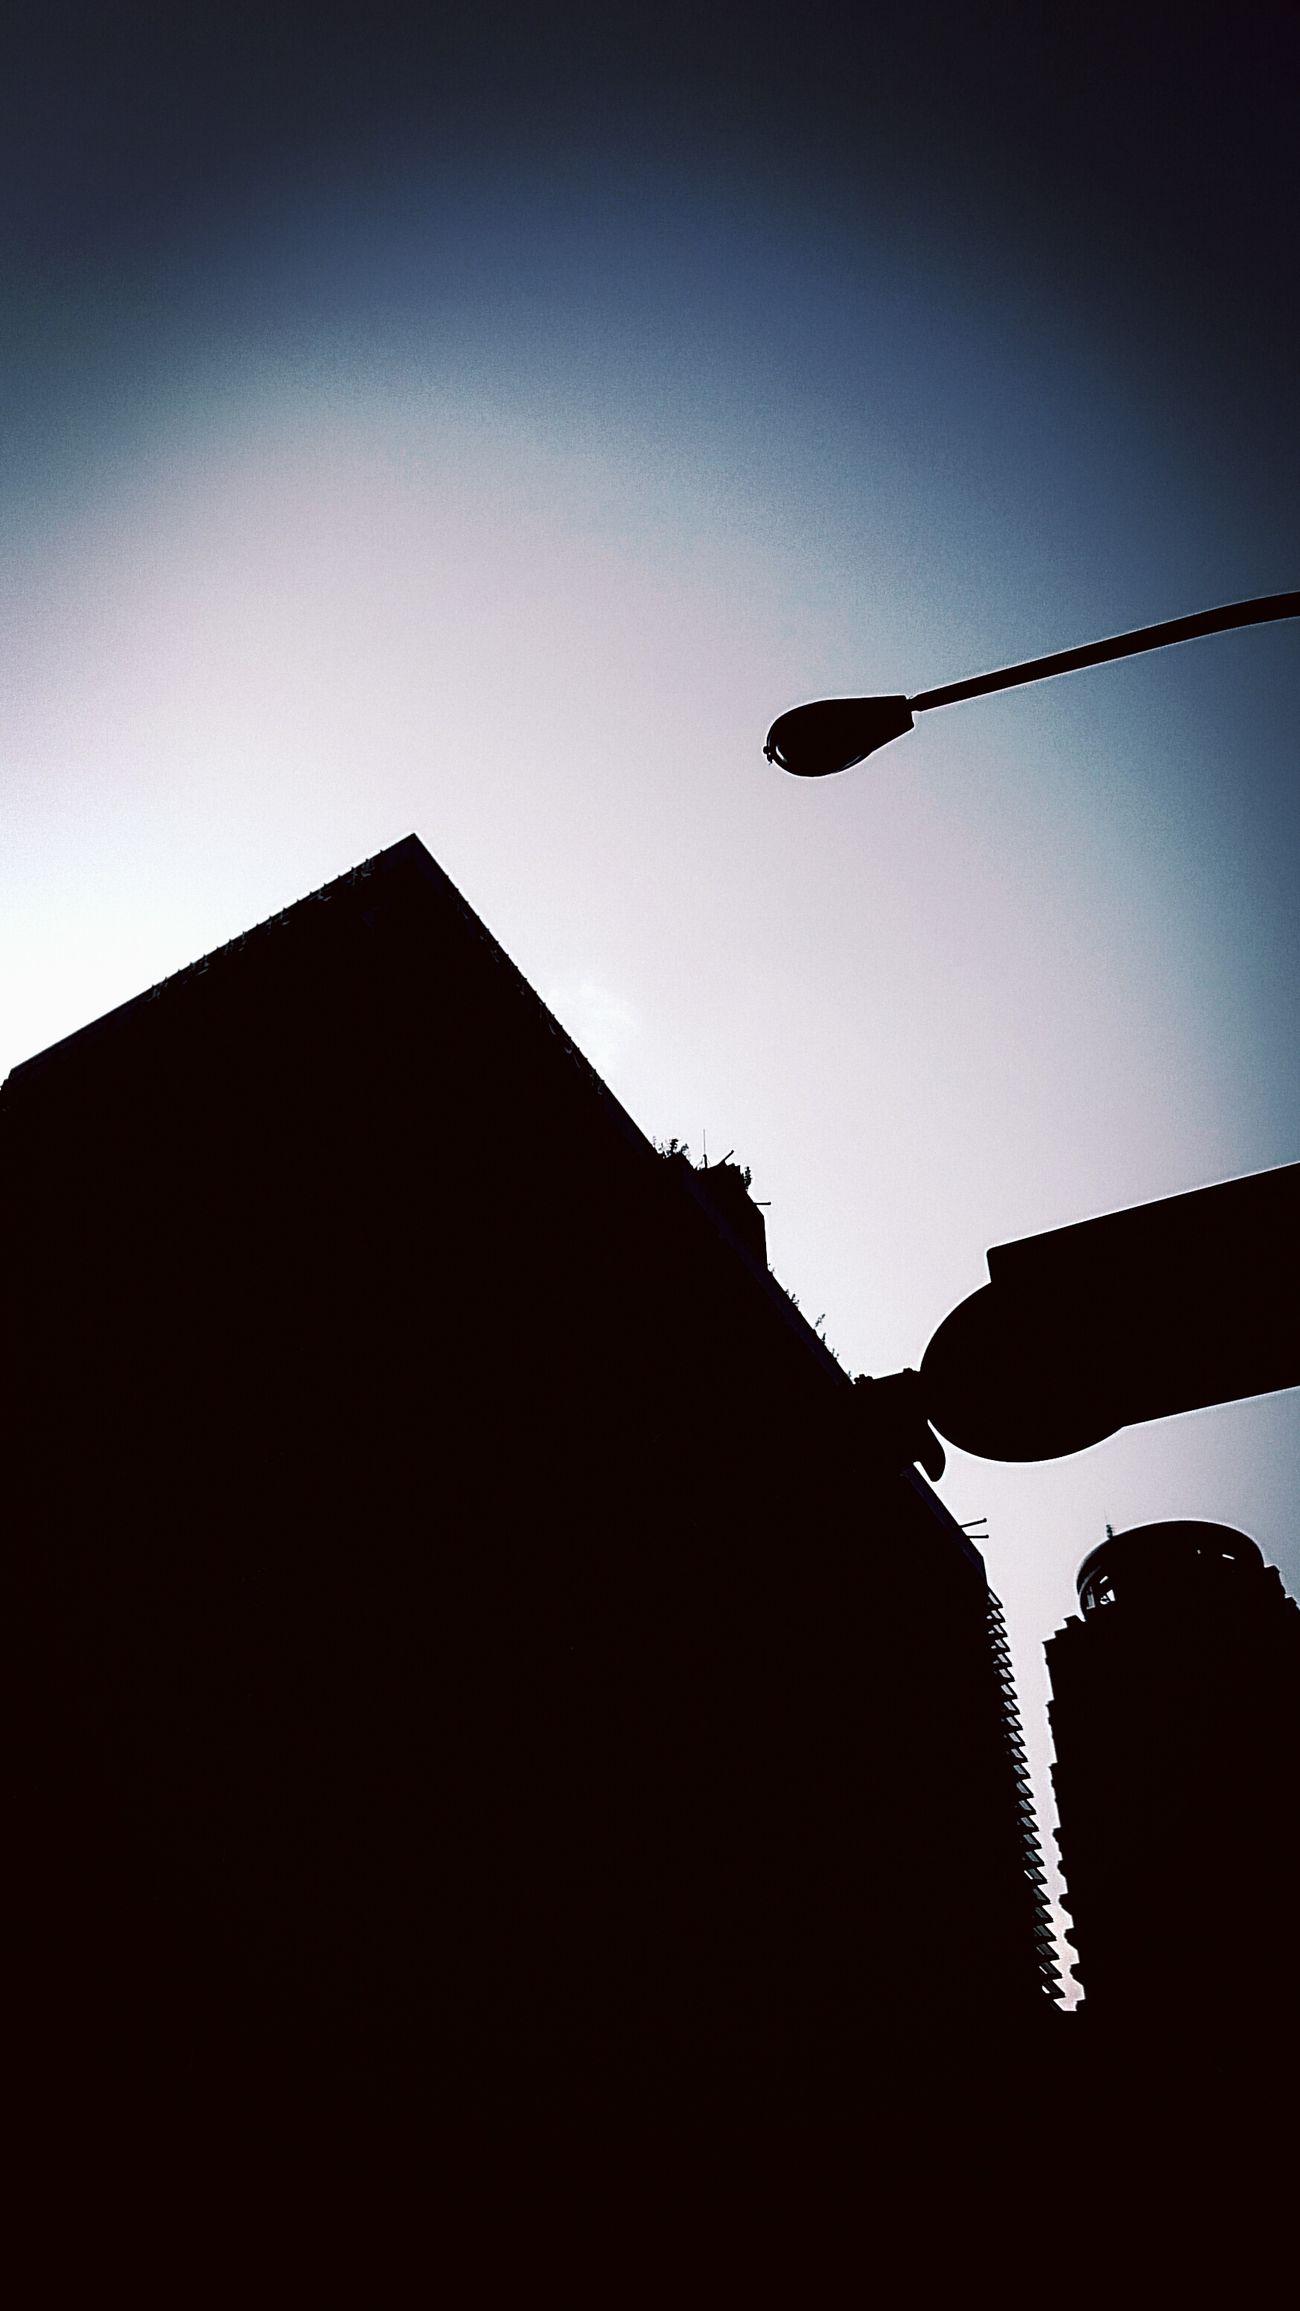 Streetphotography Monochrome EyeEm Best Shots AMPt_community